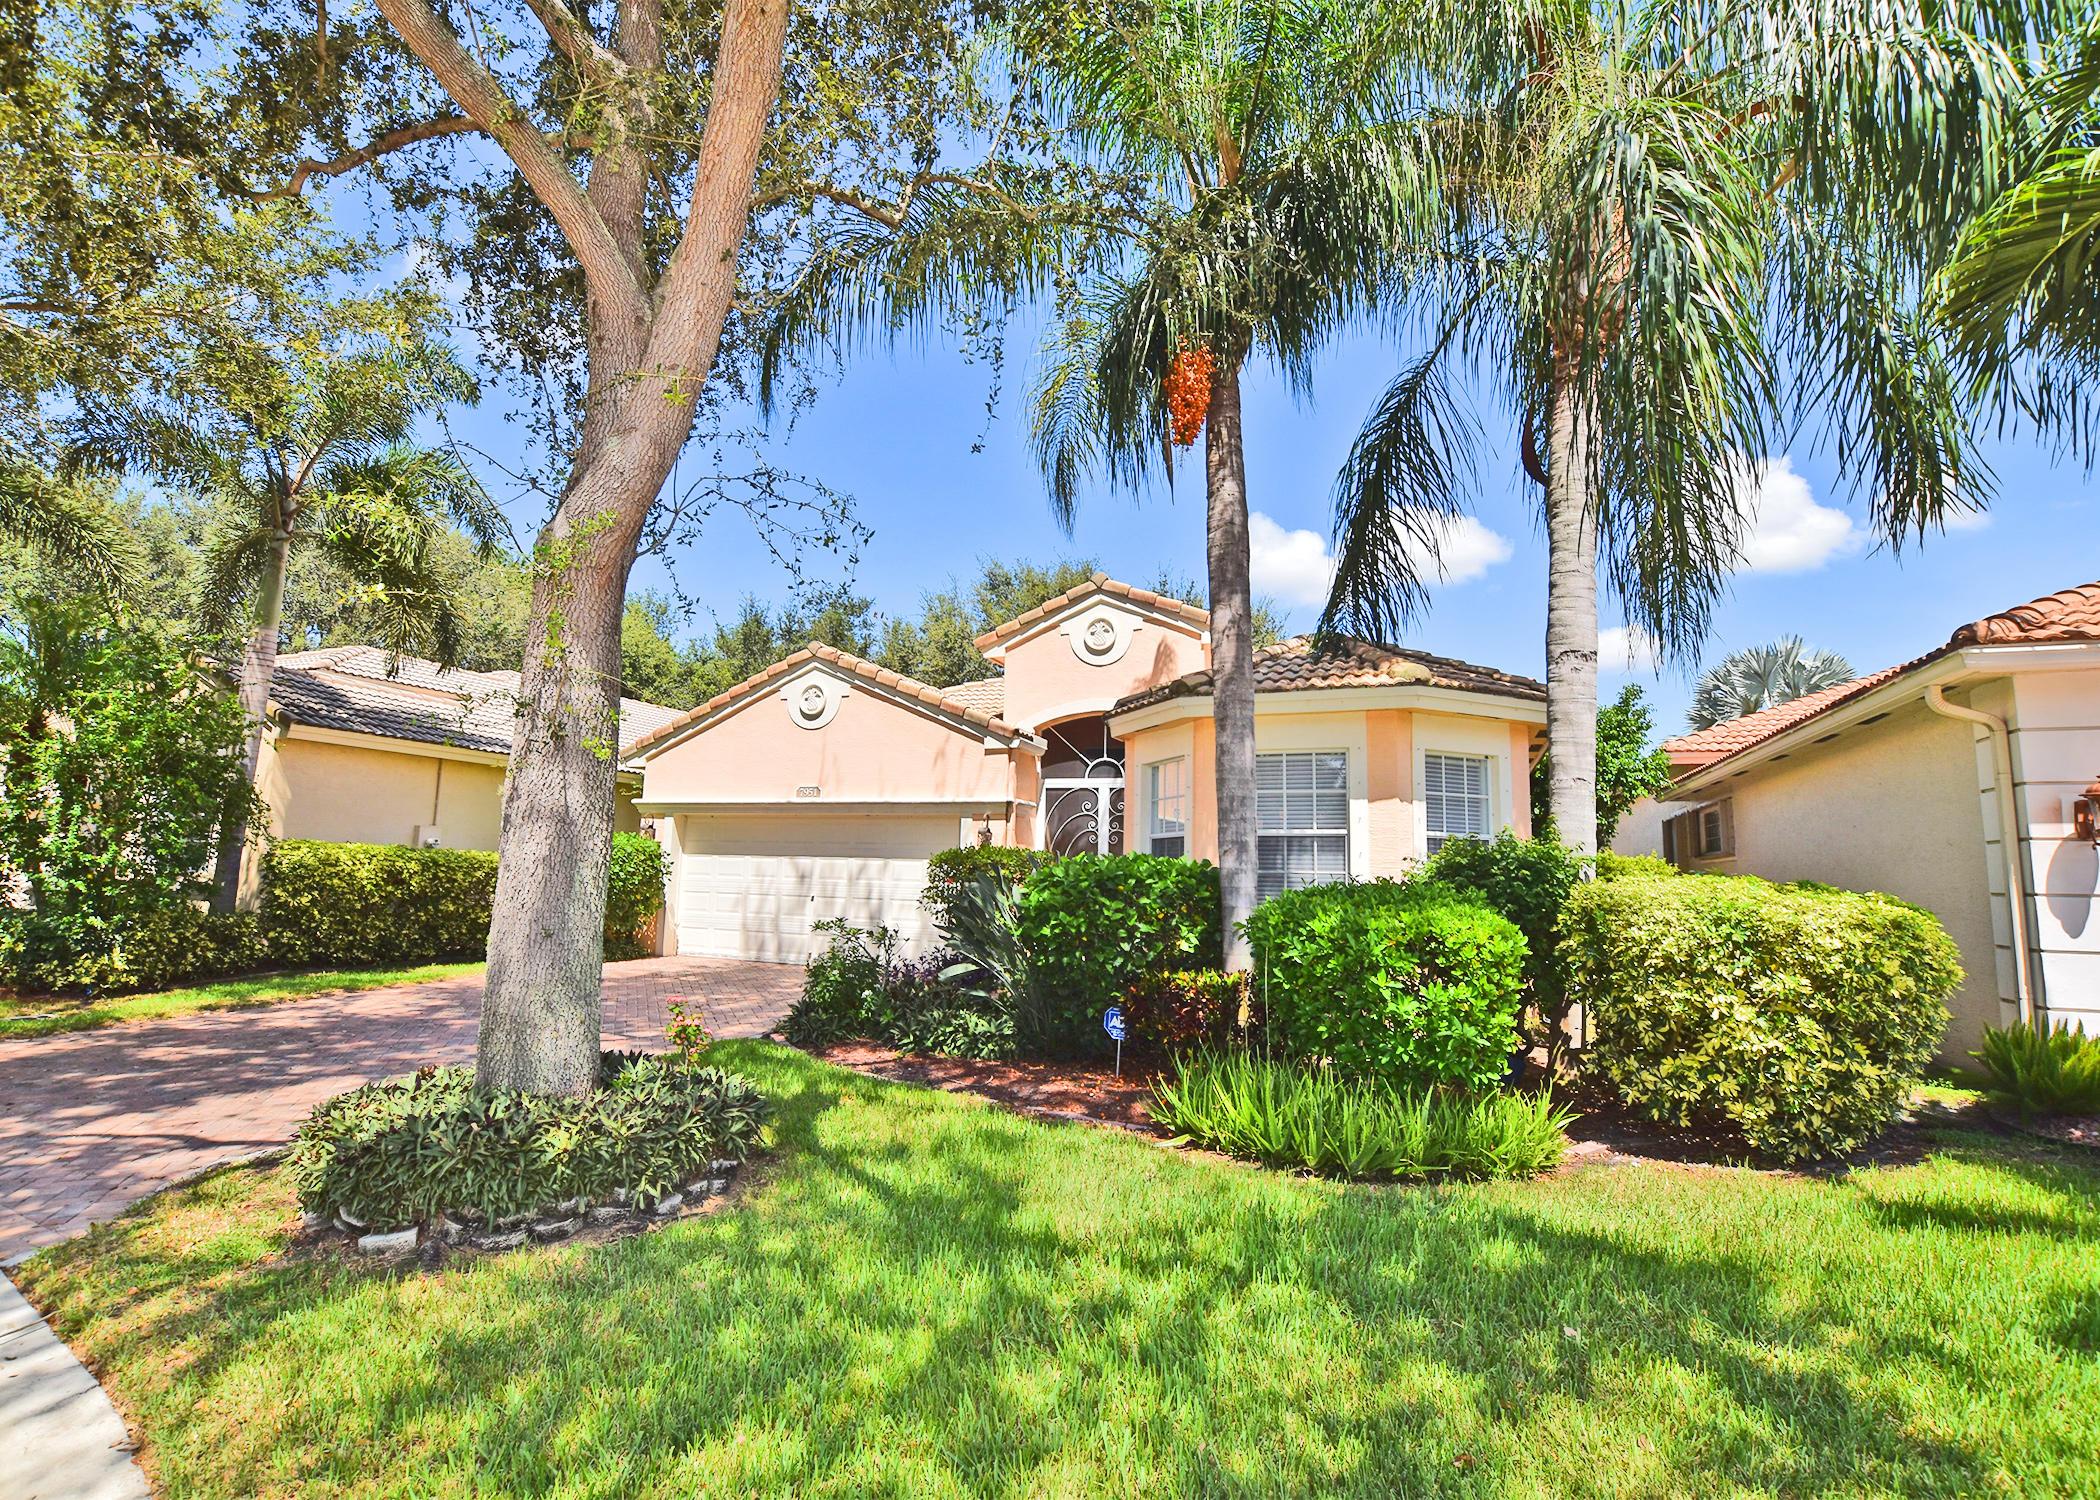 7951 New Holland Way  Boynton Beach, FL 33437